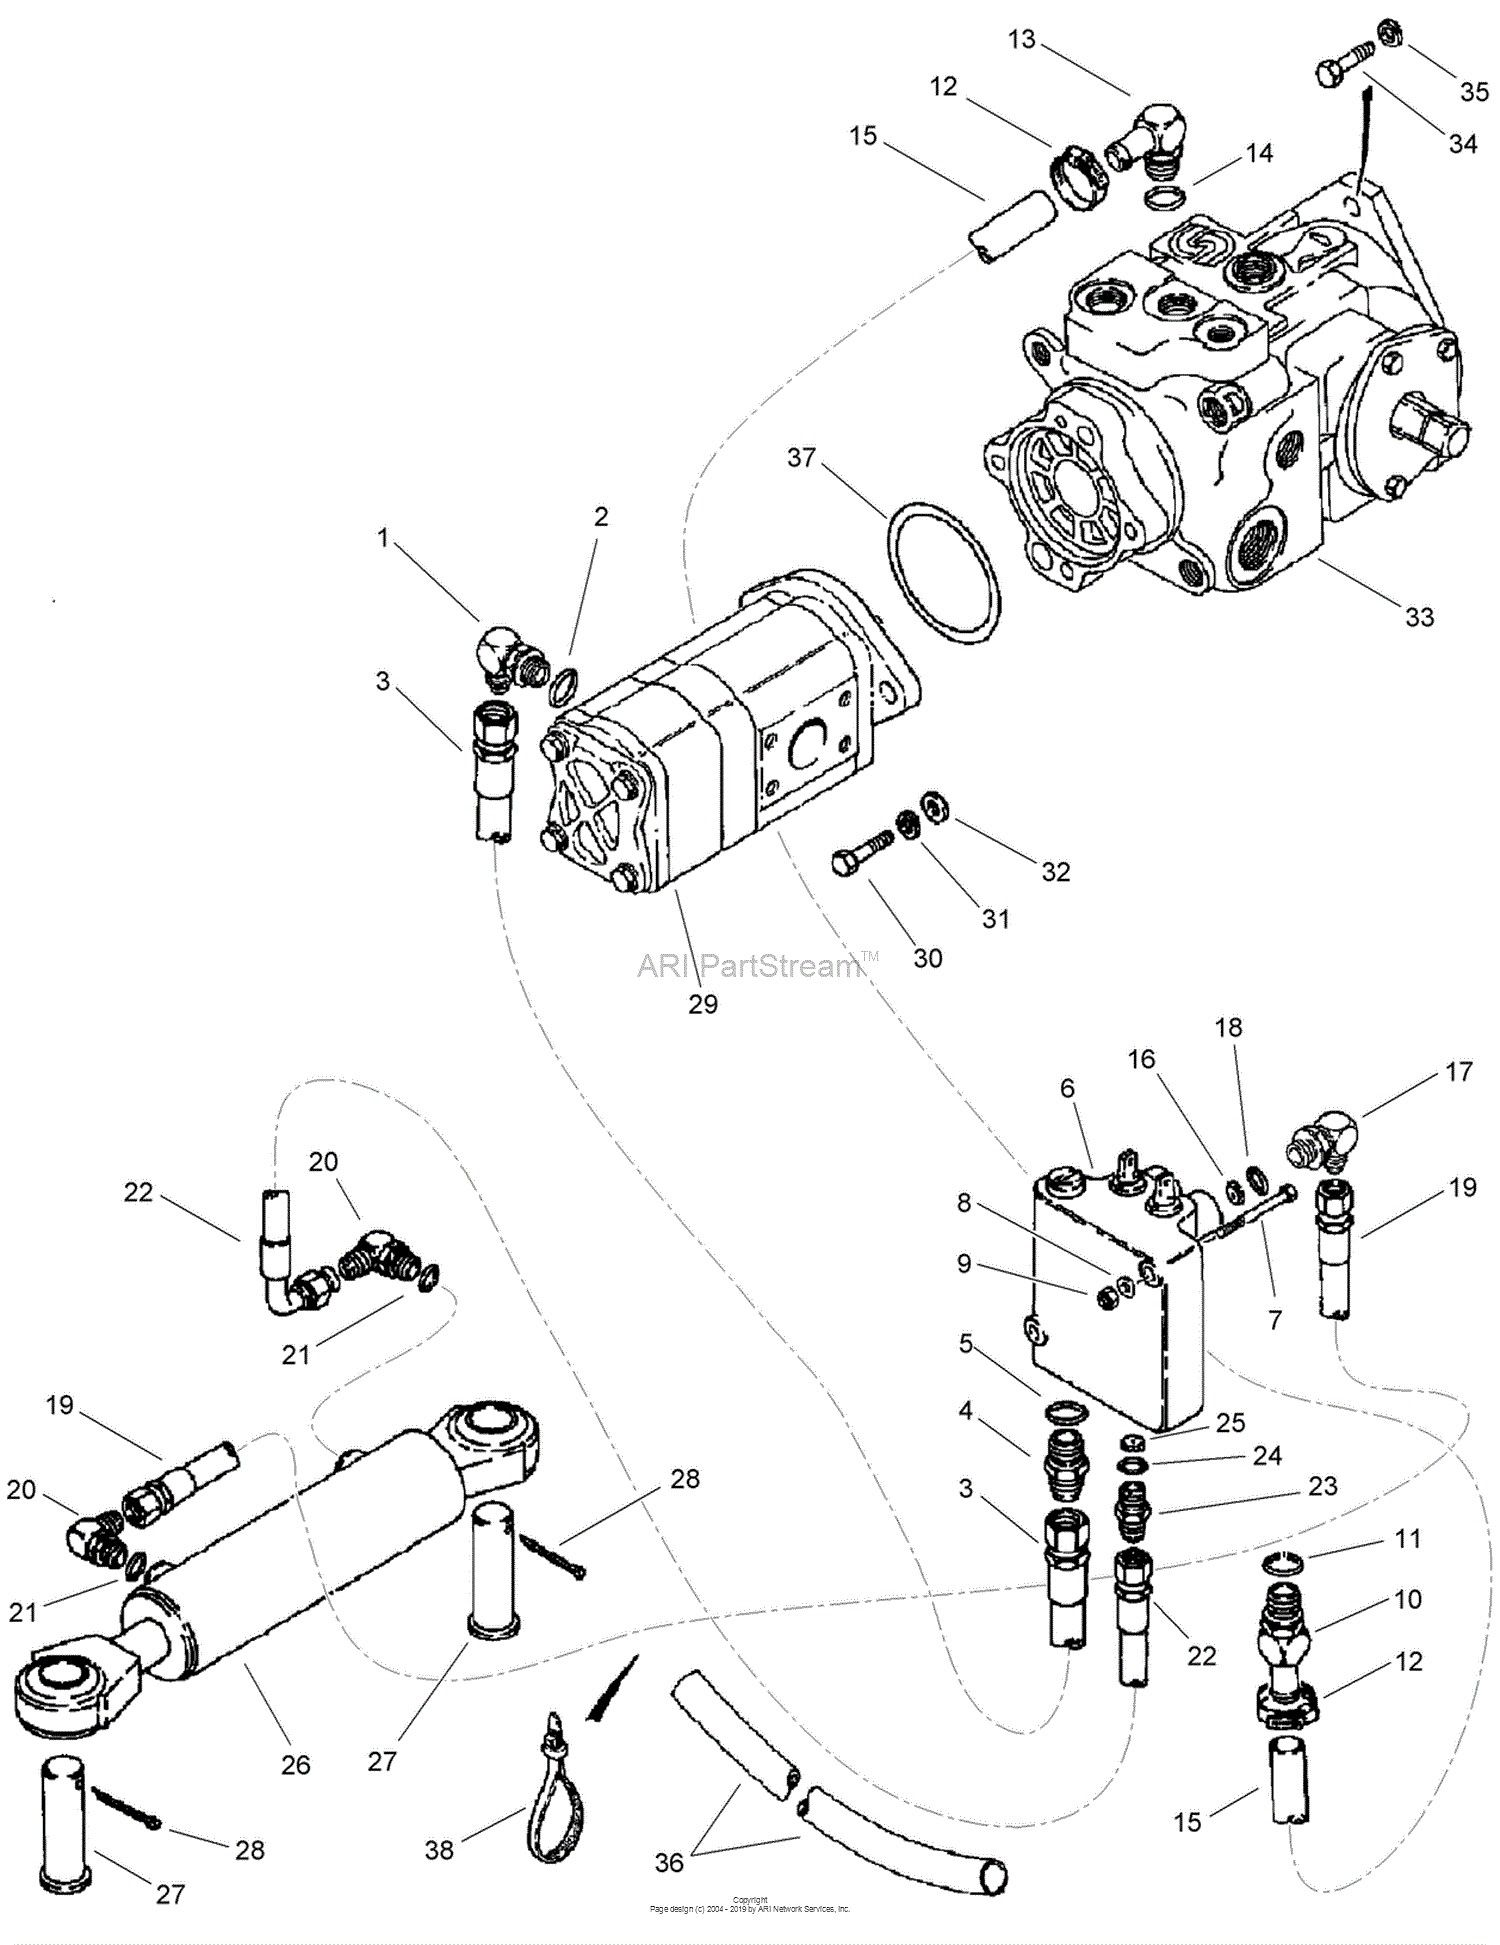 Snorkel Lift Steering Wiring Diagram In 2020 Diagram Electrical Wiring Diagram How Are You Feeling